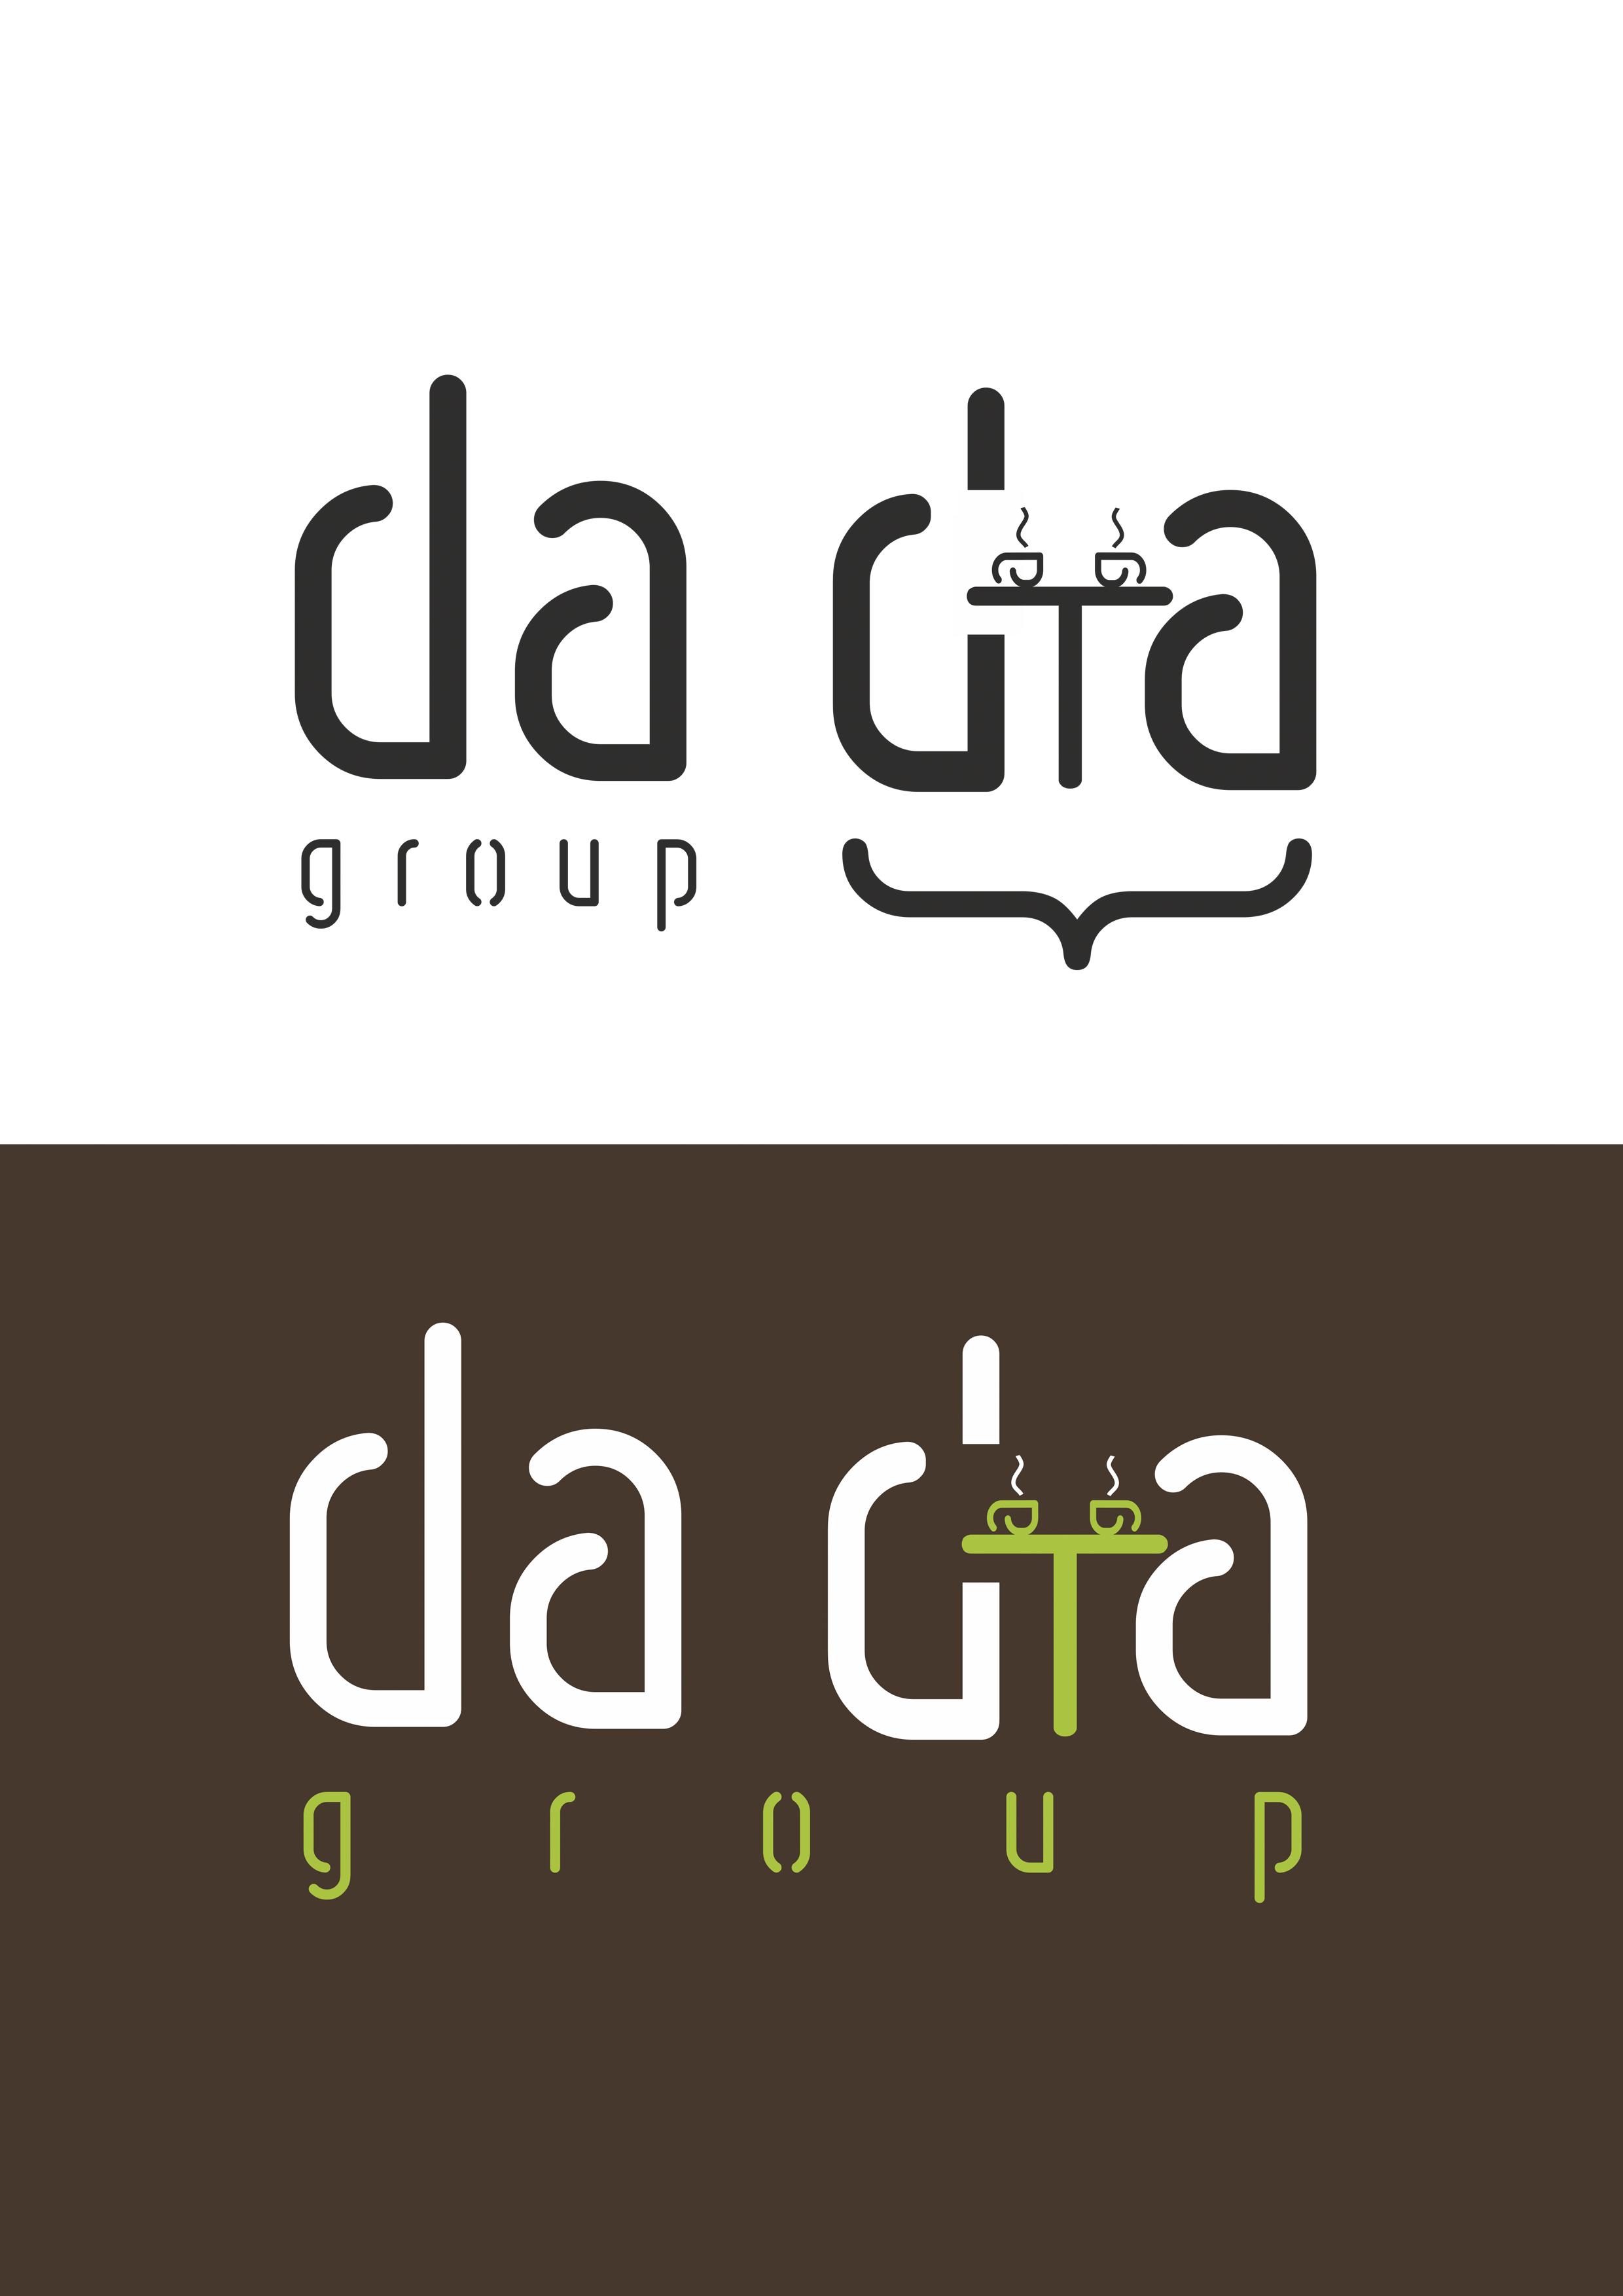 Разработка логотипа фото f_498598bf3cb0477d.jpg